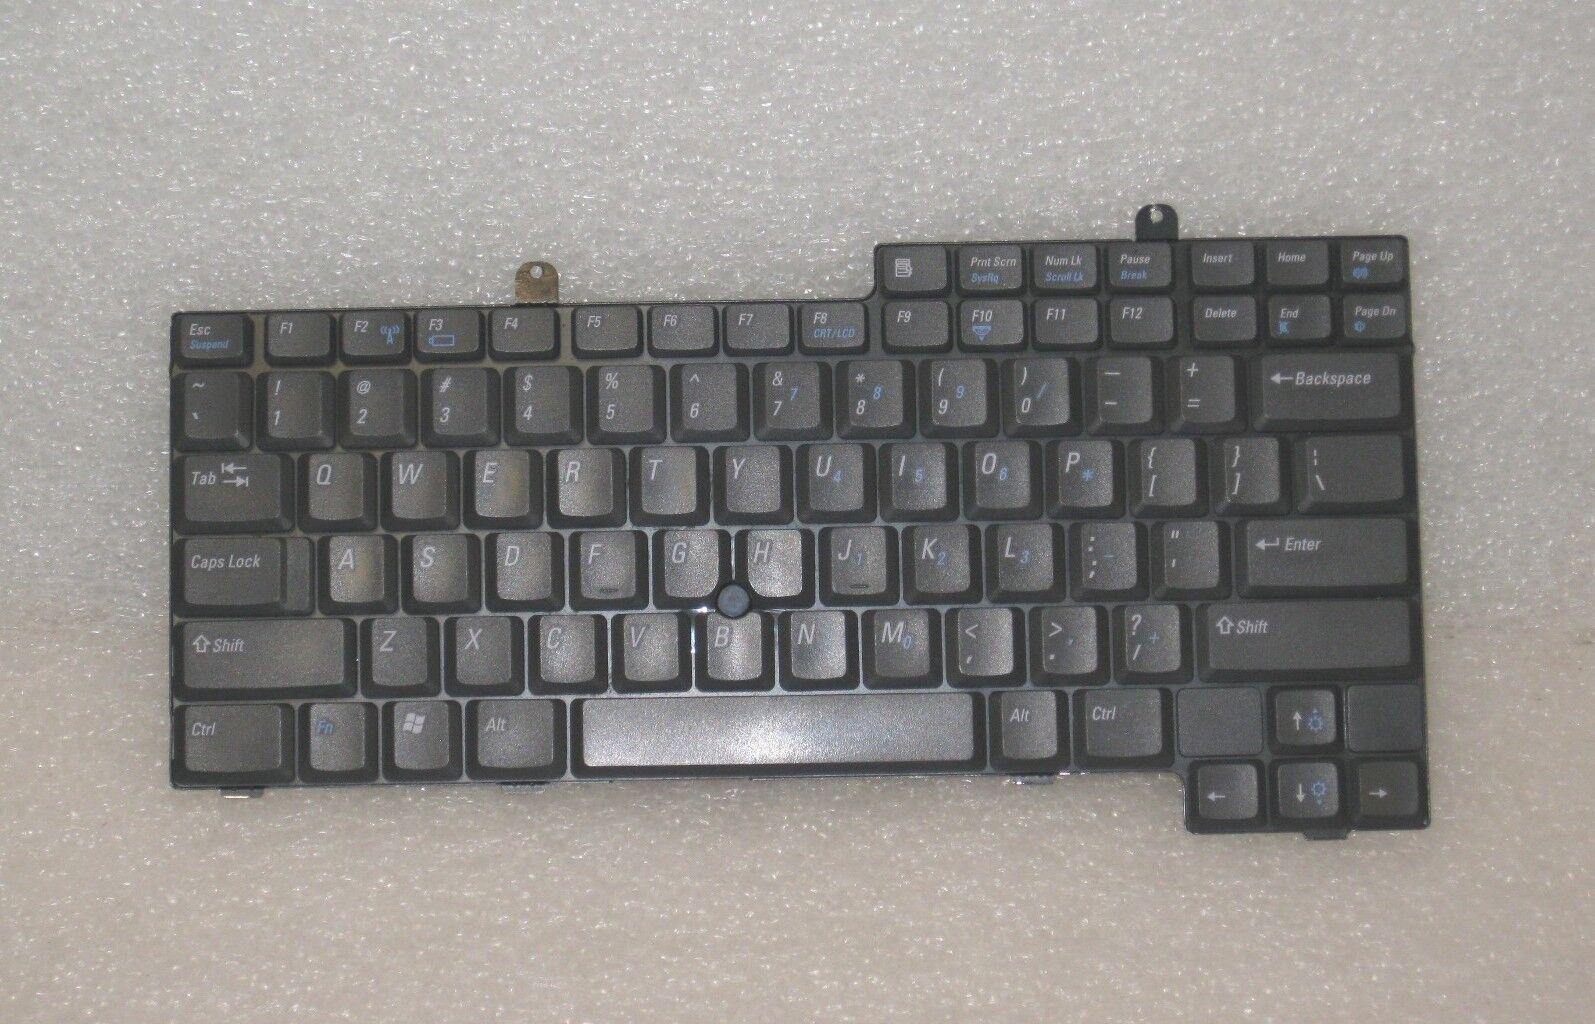 Original Dell Latitude 8500 8600 Precision M60 Laptop Keyboard 1M745 01M745  Computer Components & Parts Laptop Replacement Parts